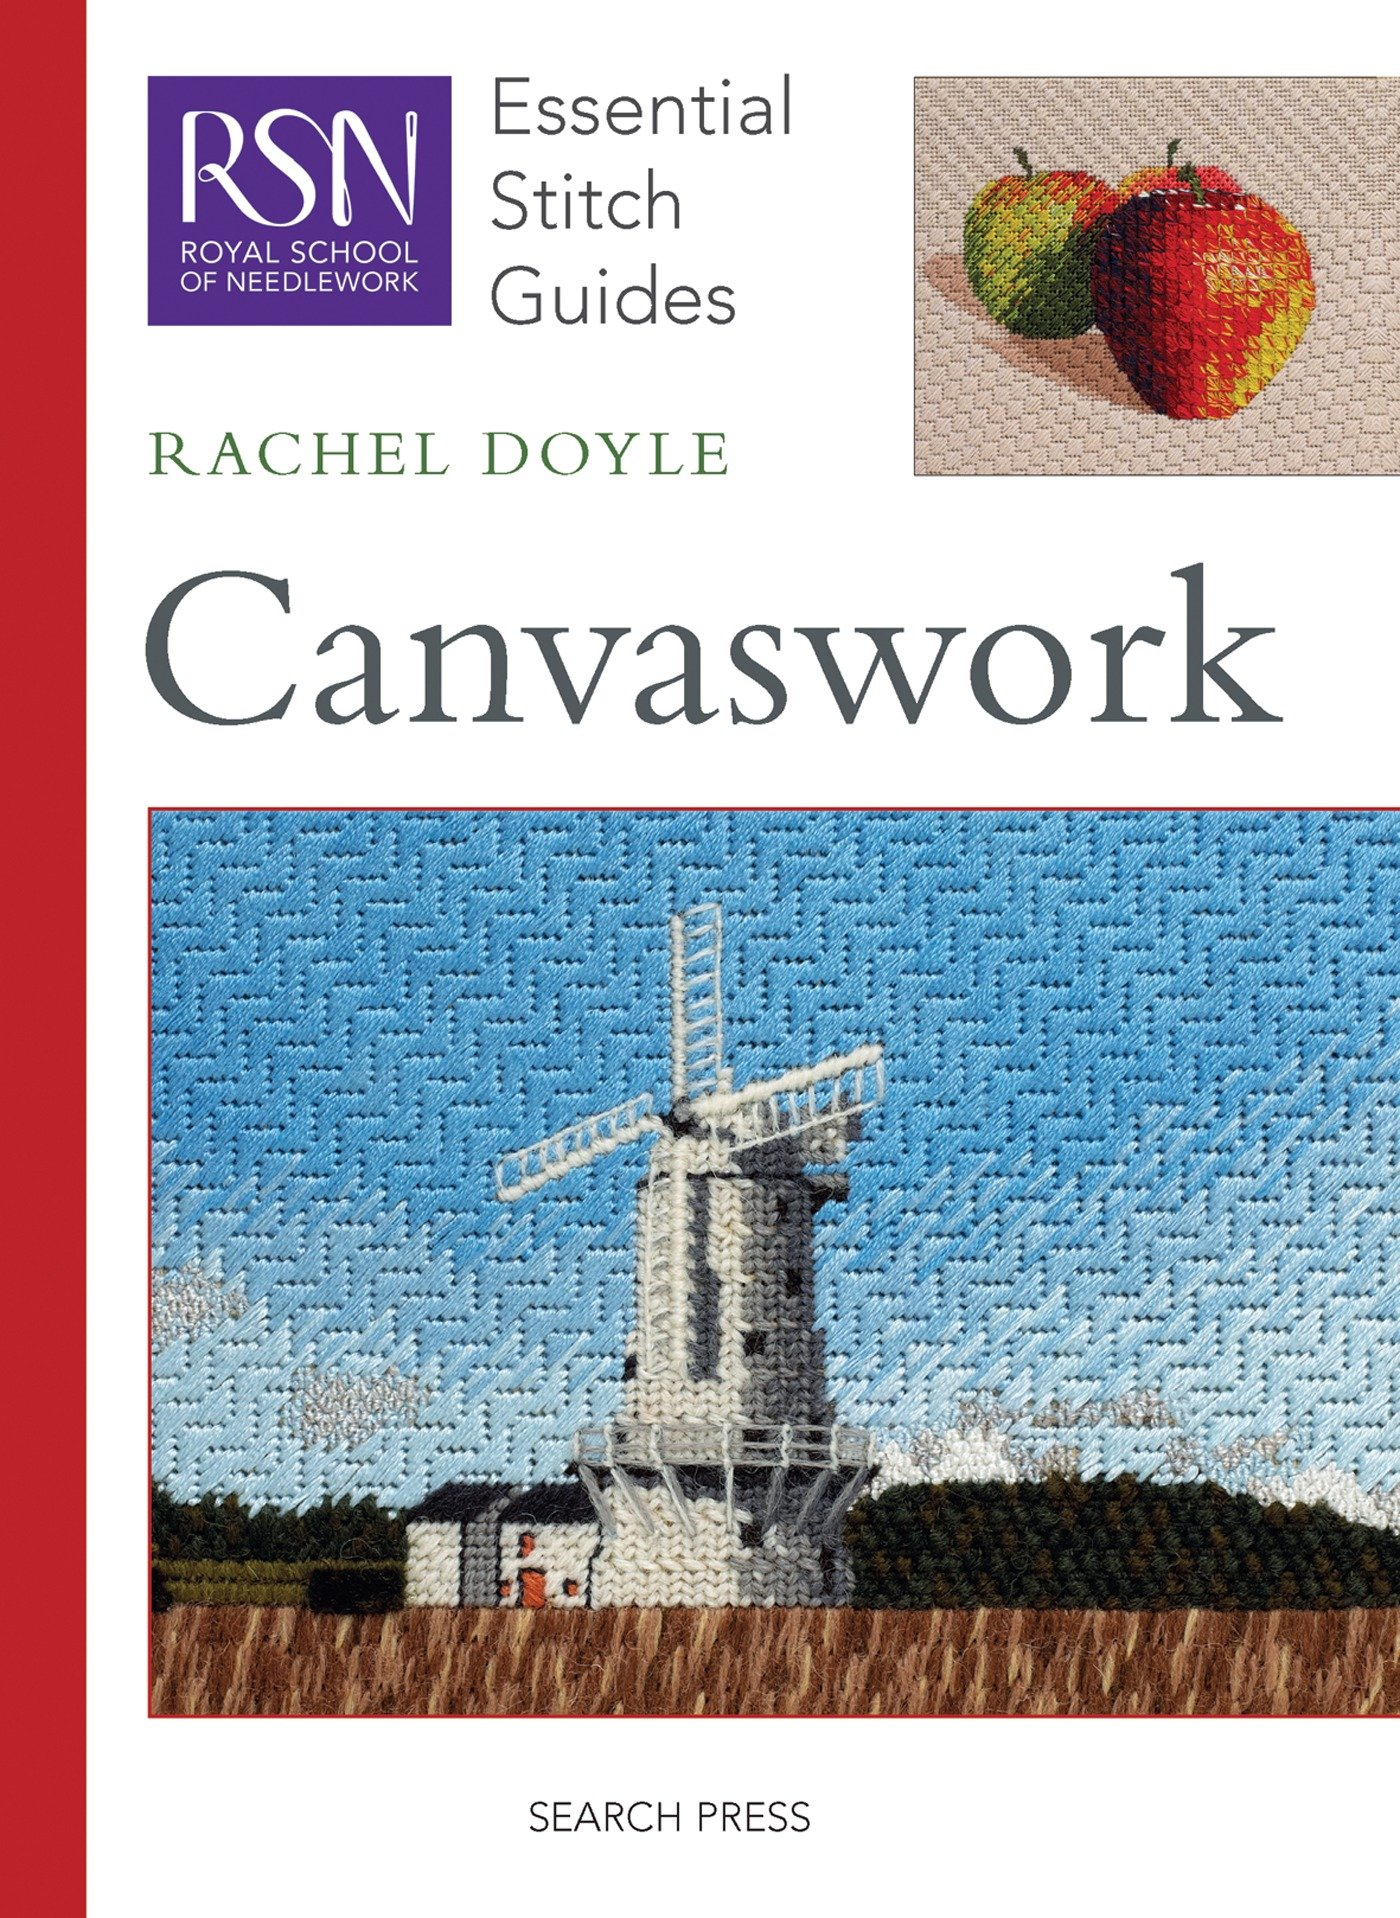 RSN ESG: Canvaswork: Essential Stitch Guides (Royal School of Needlework Essential Stitch Guides)